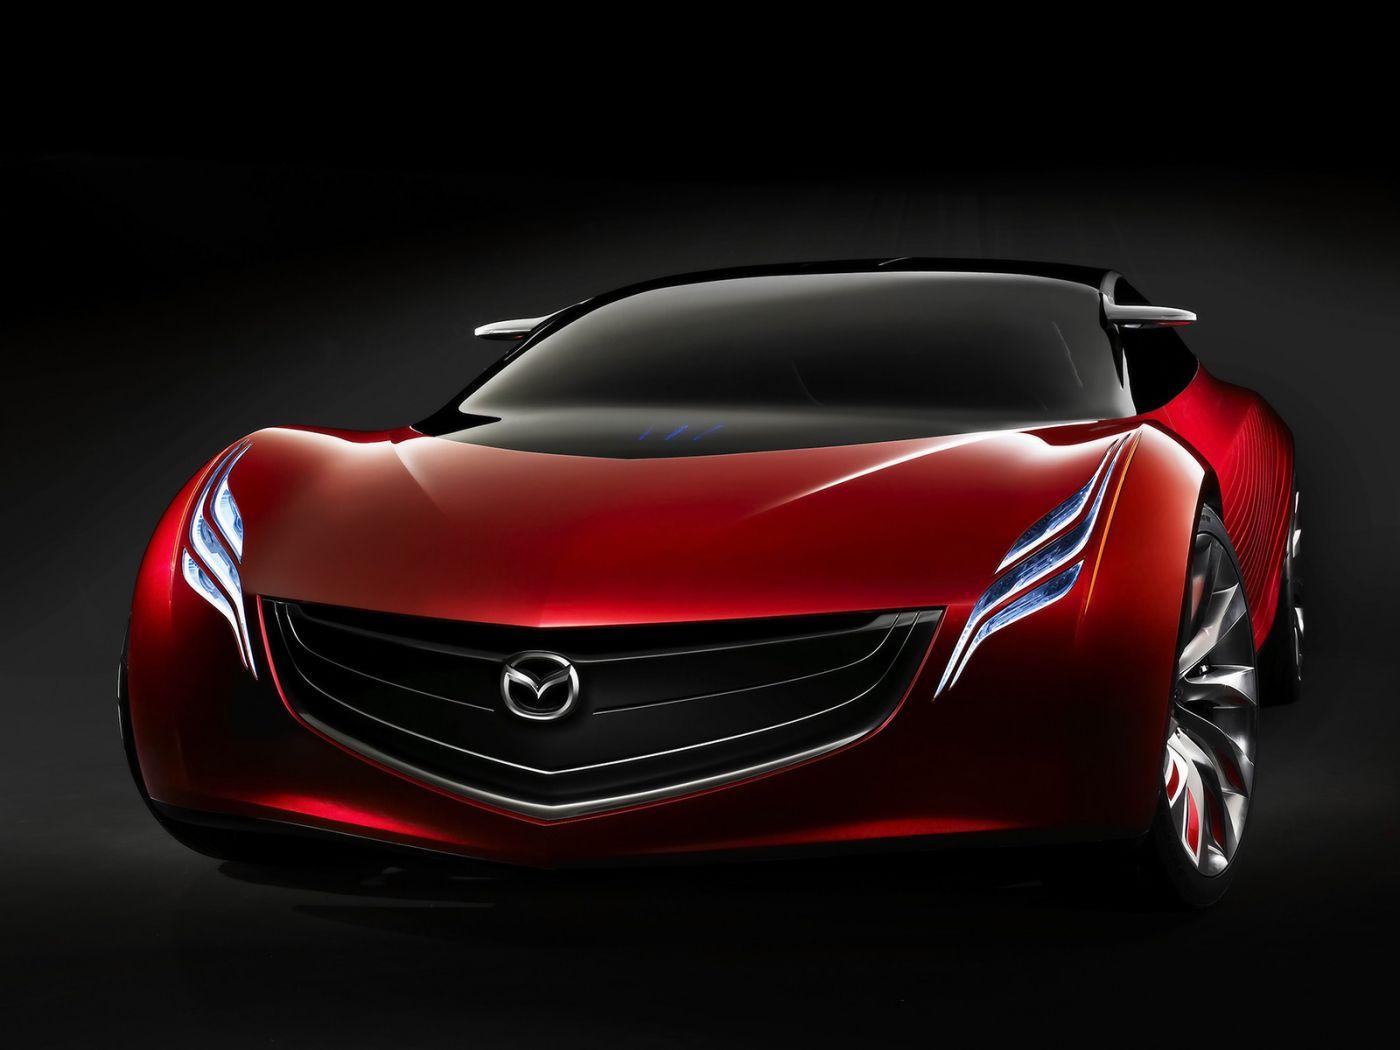 Mazda Ryuga Concept Front Low Angle Wallpaper 1400x1050